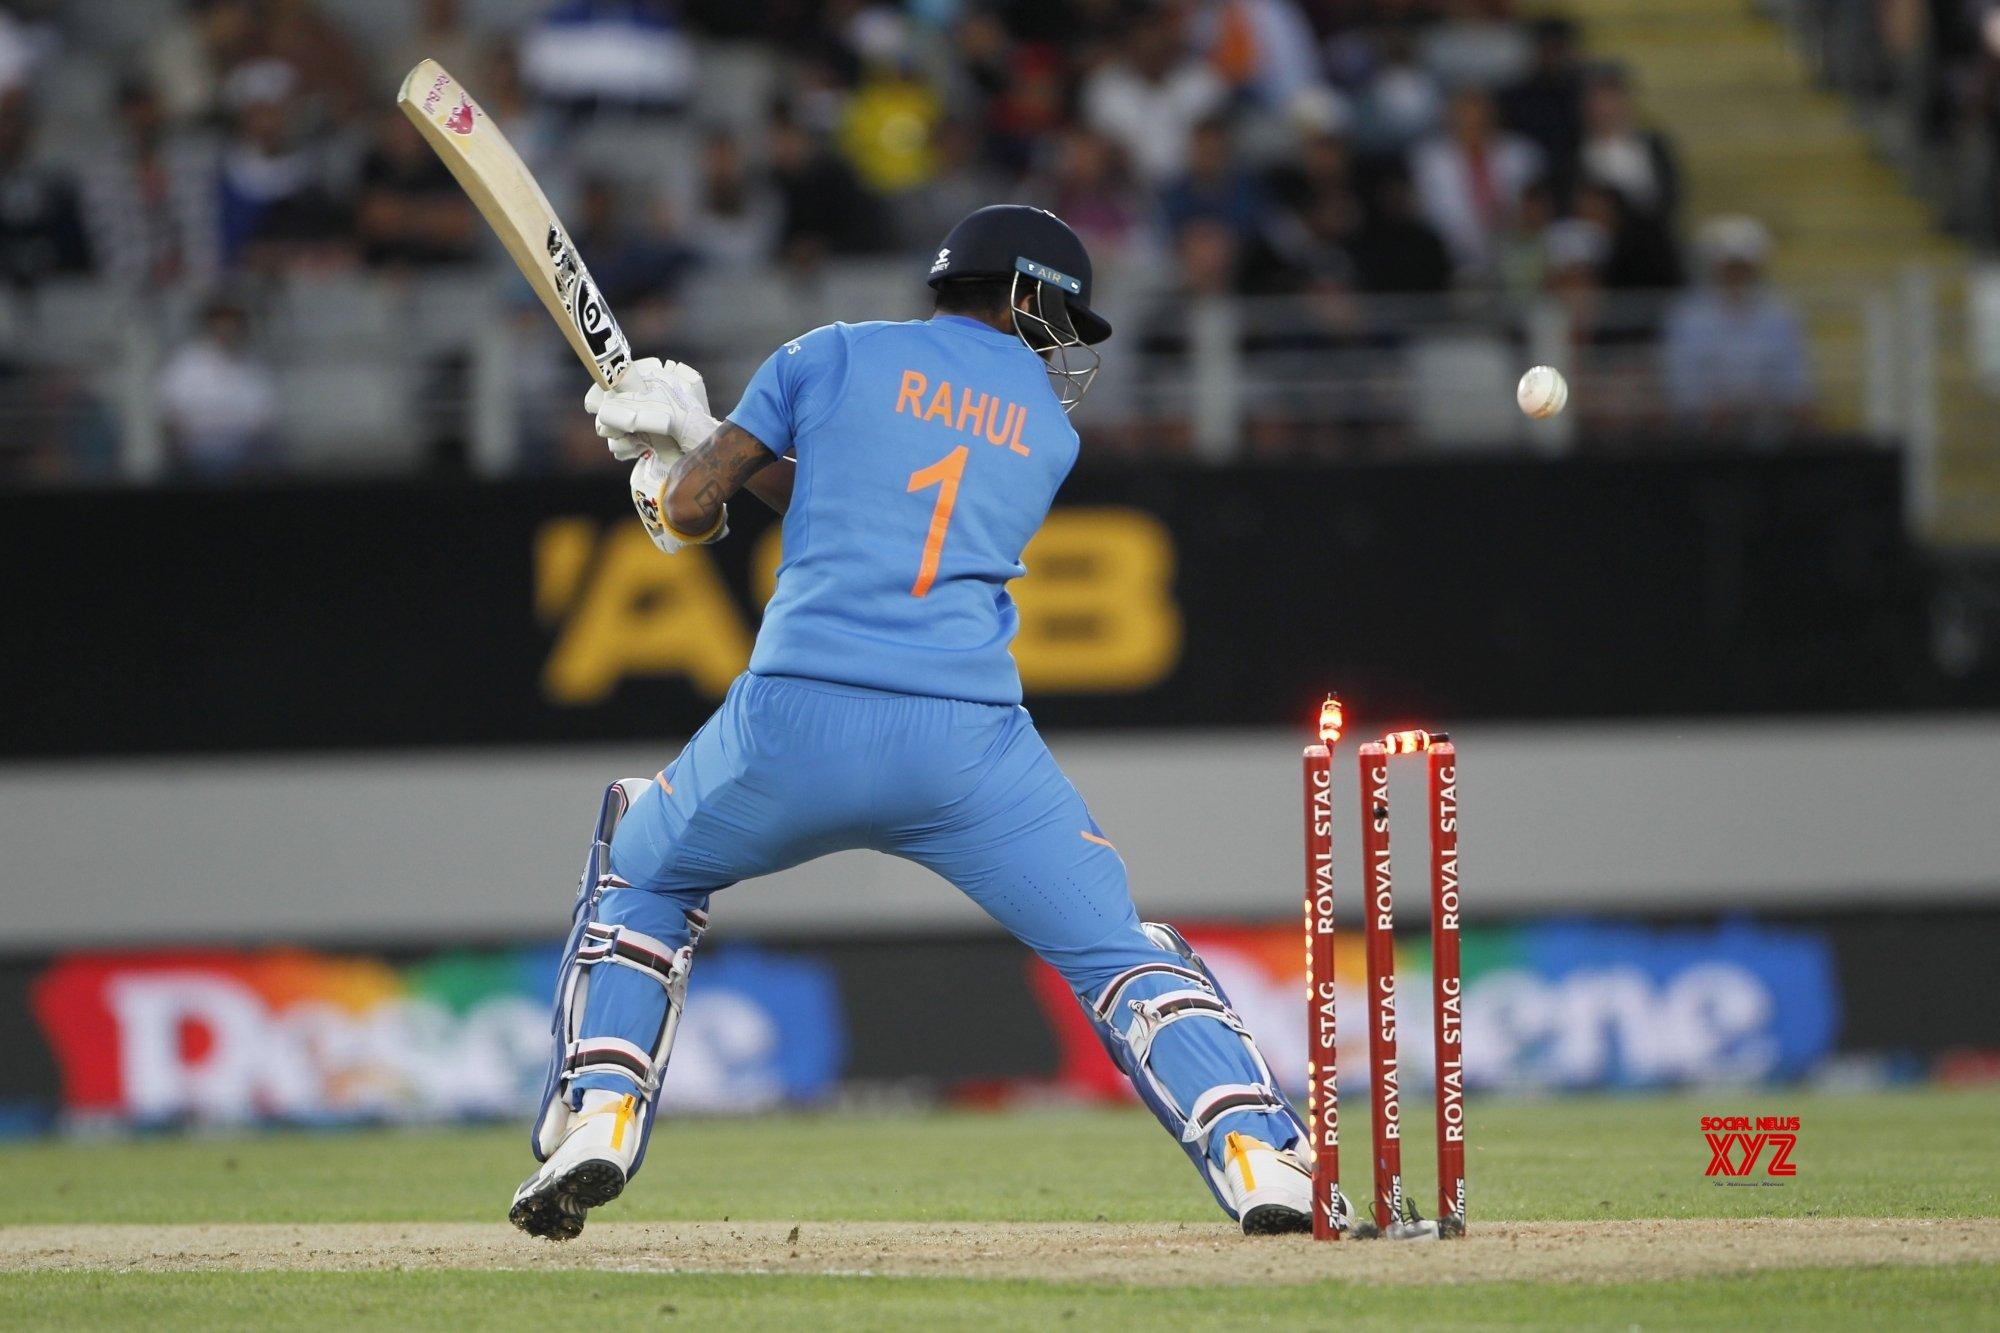 Auckland: 2nd ODI - India Vs New Zealand (Batch - 12) #Gallery